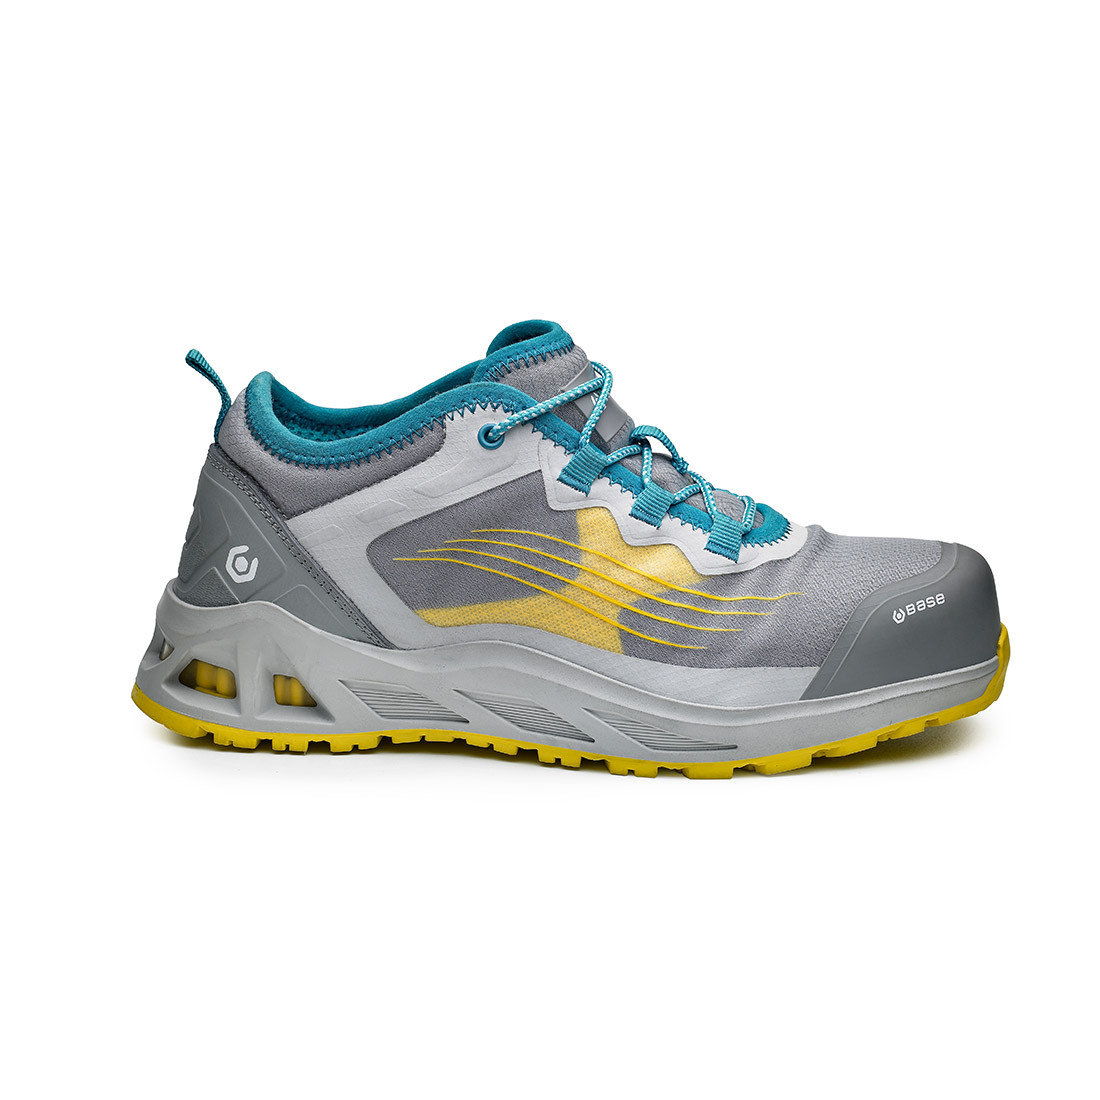 Pantofi K-Pop S1P HRO SRC - Incaltaminte de protectie